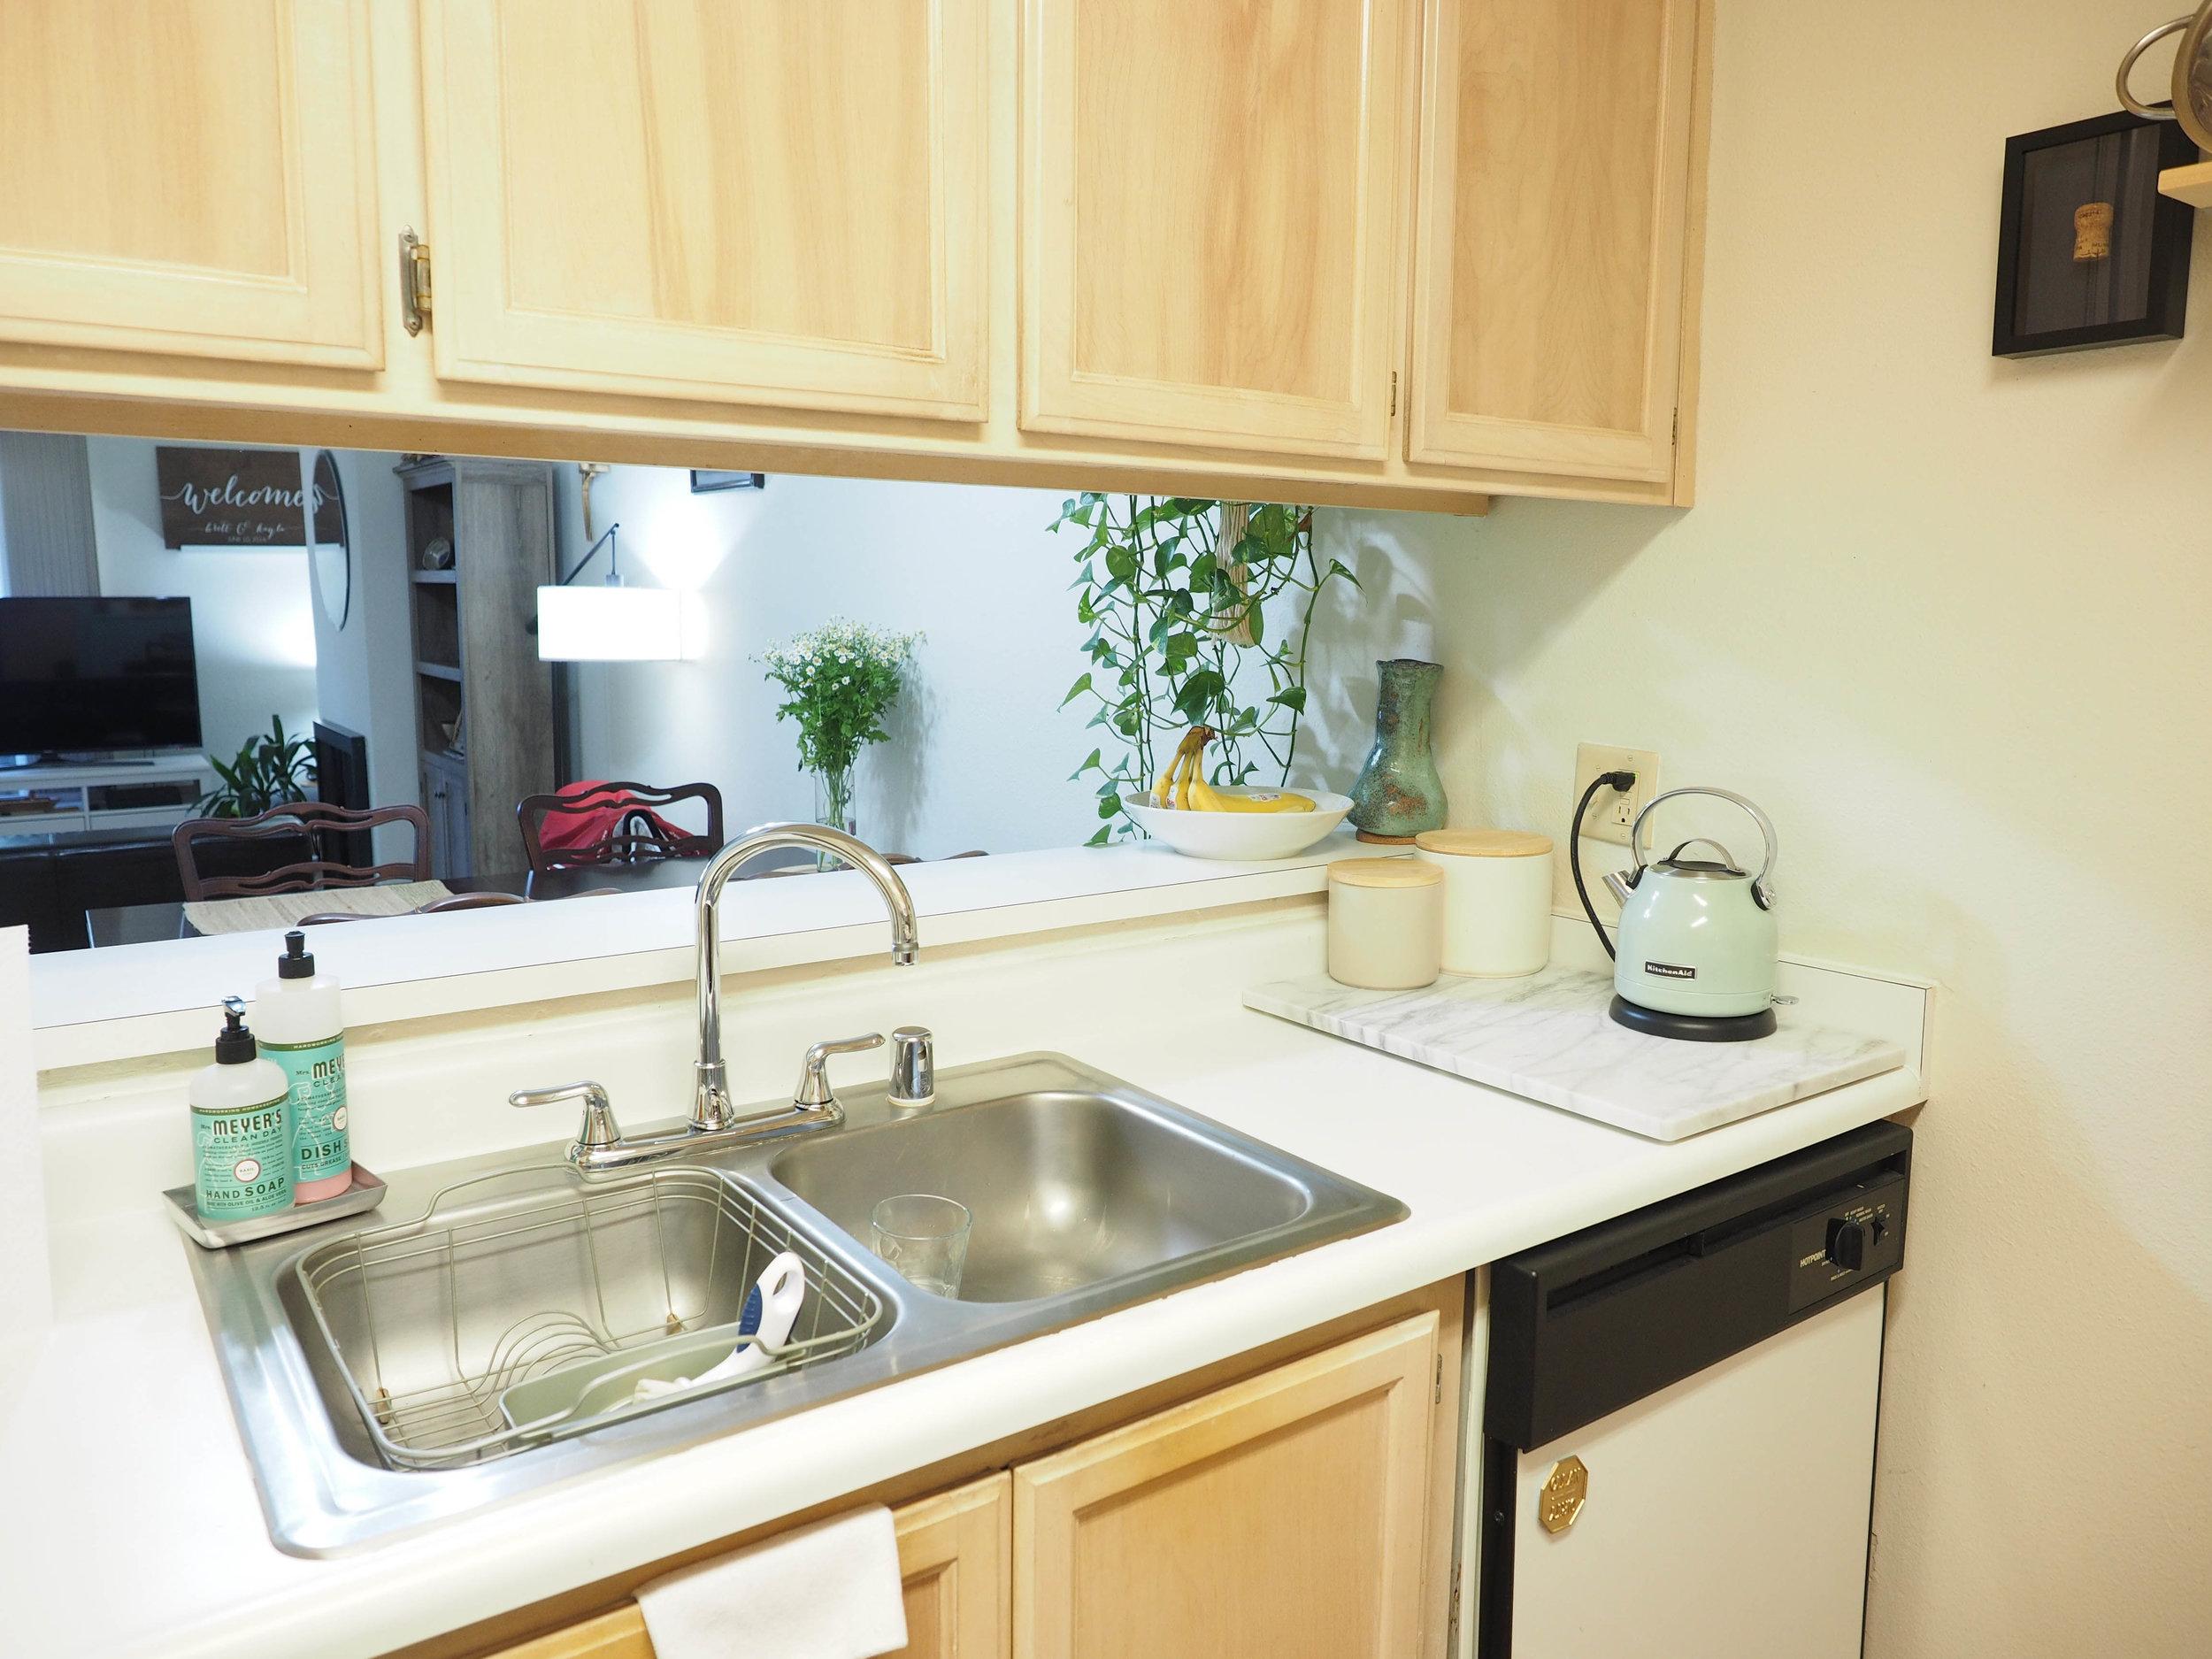 apartment-tour-twoh-18.jpg